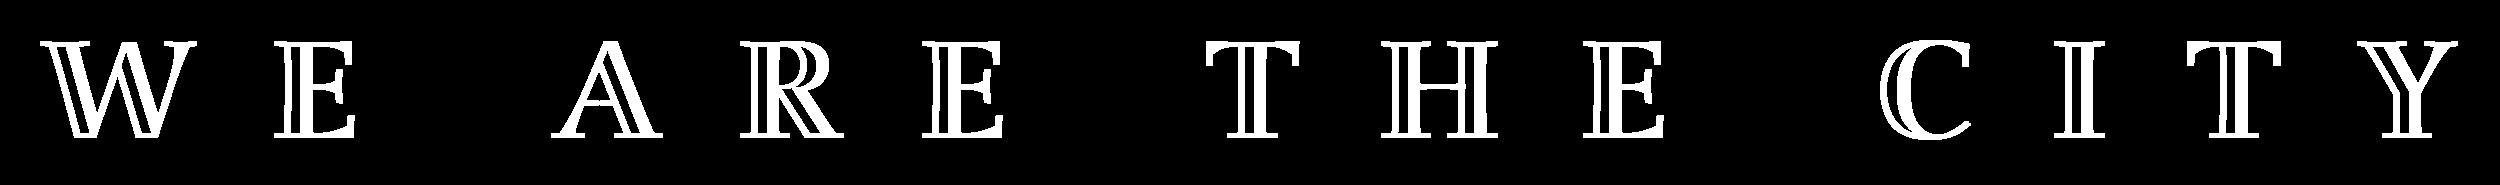 WATC-Logo1.png